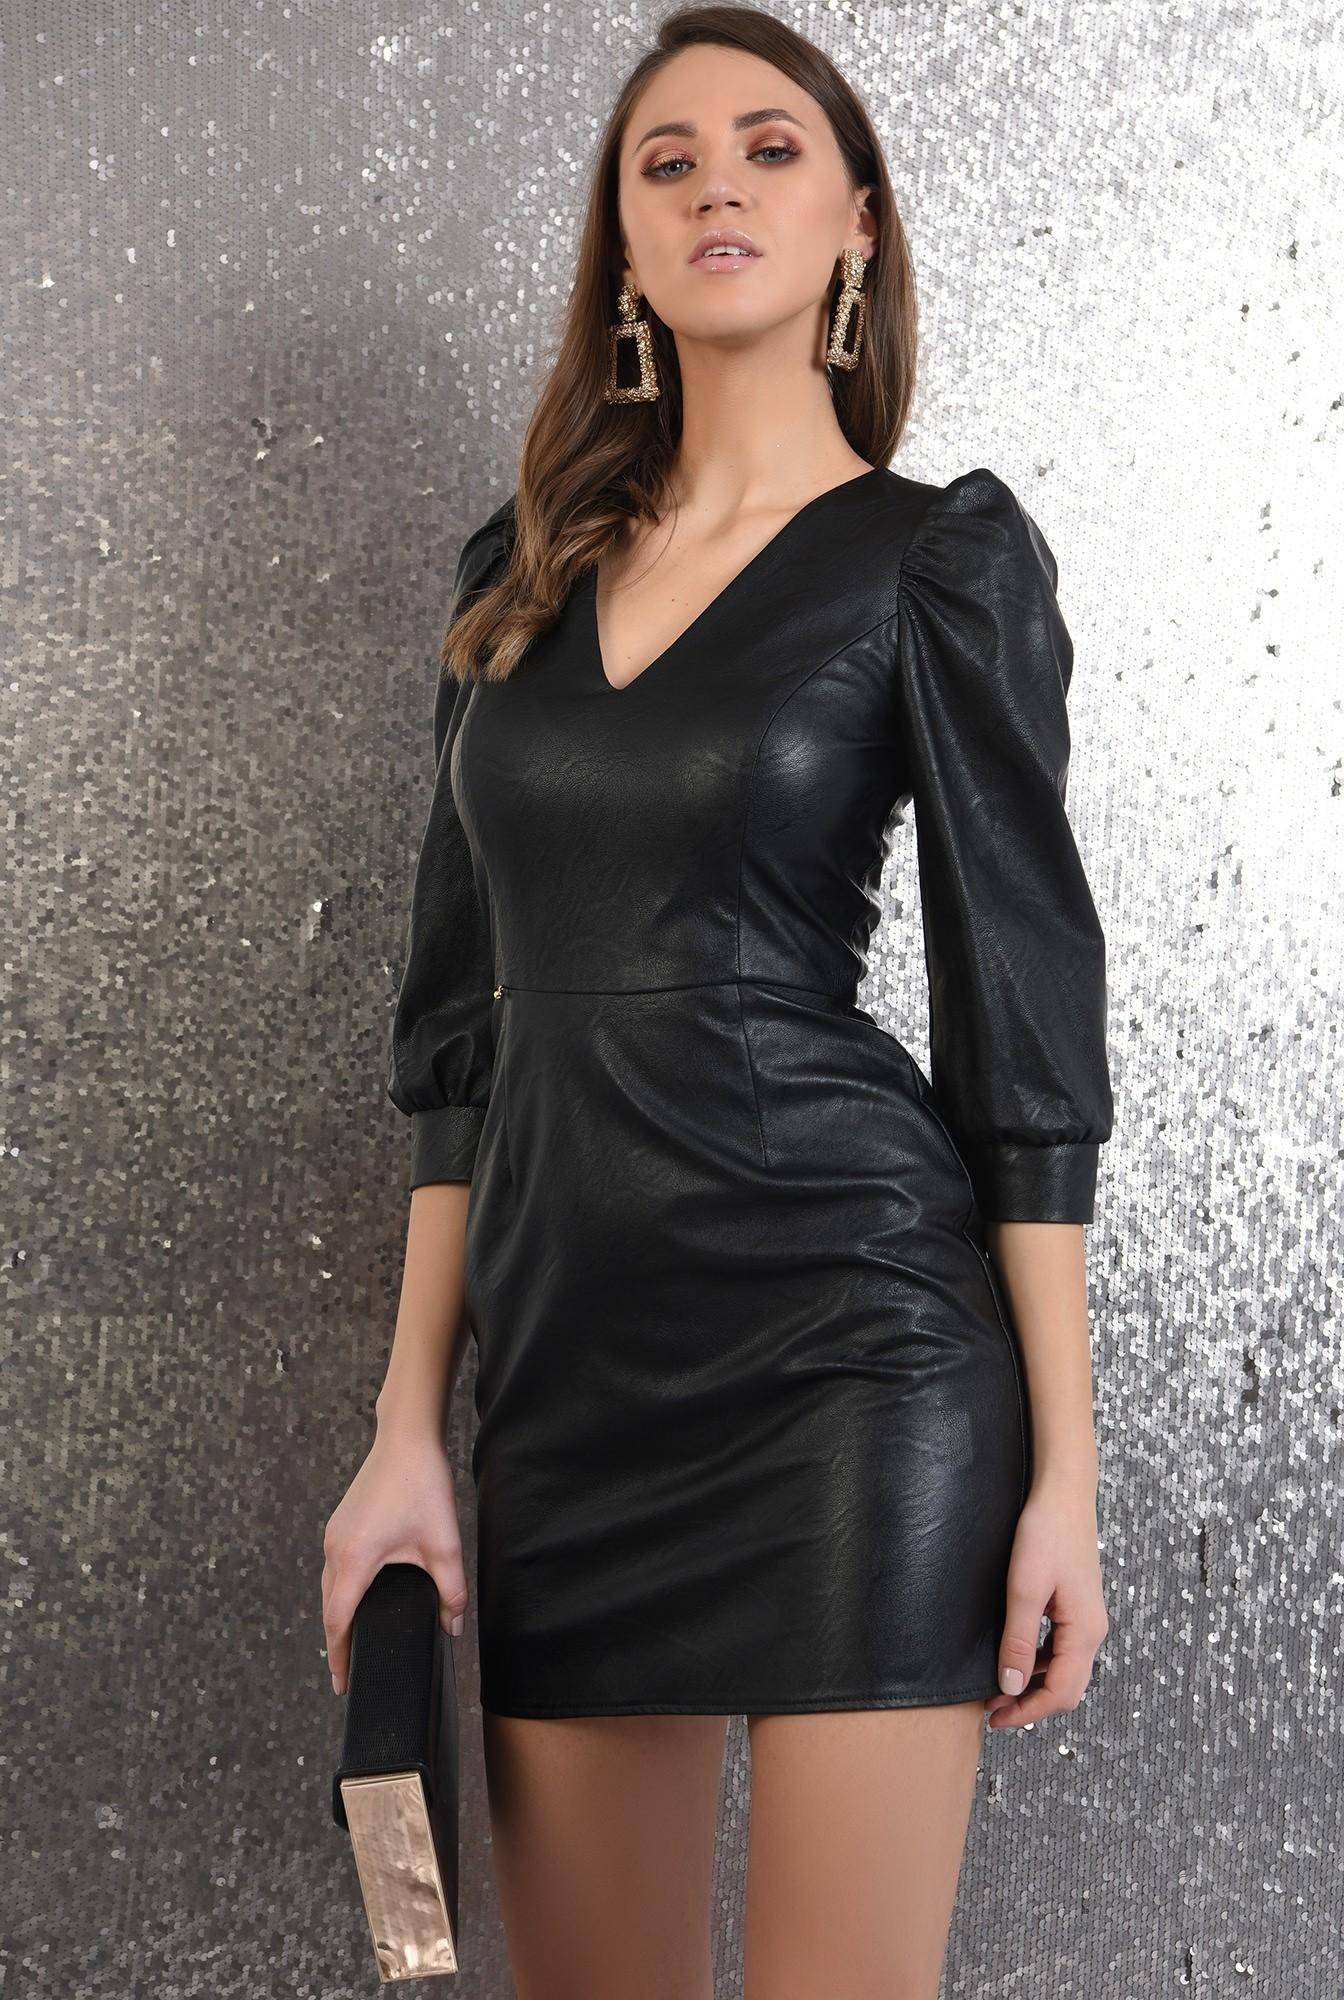 2 - rochie eleganta, din piele, neagra, Poema, maneci bufante